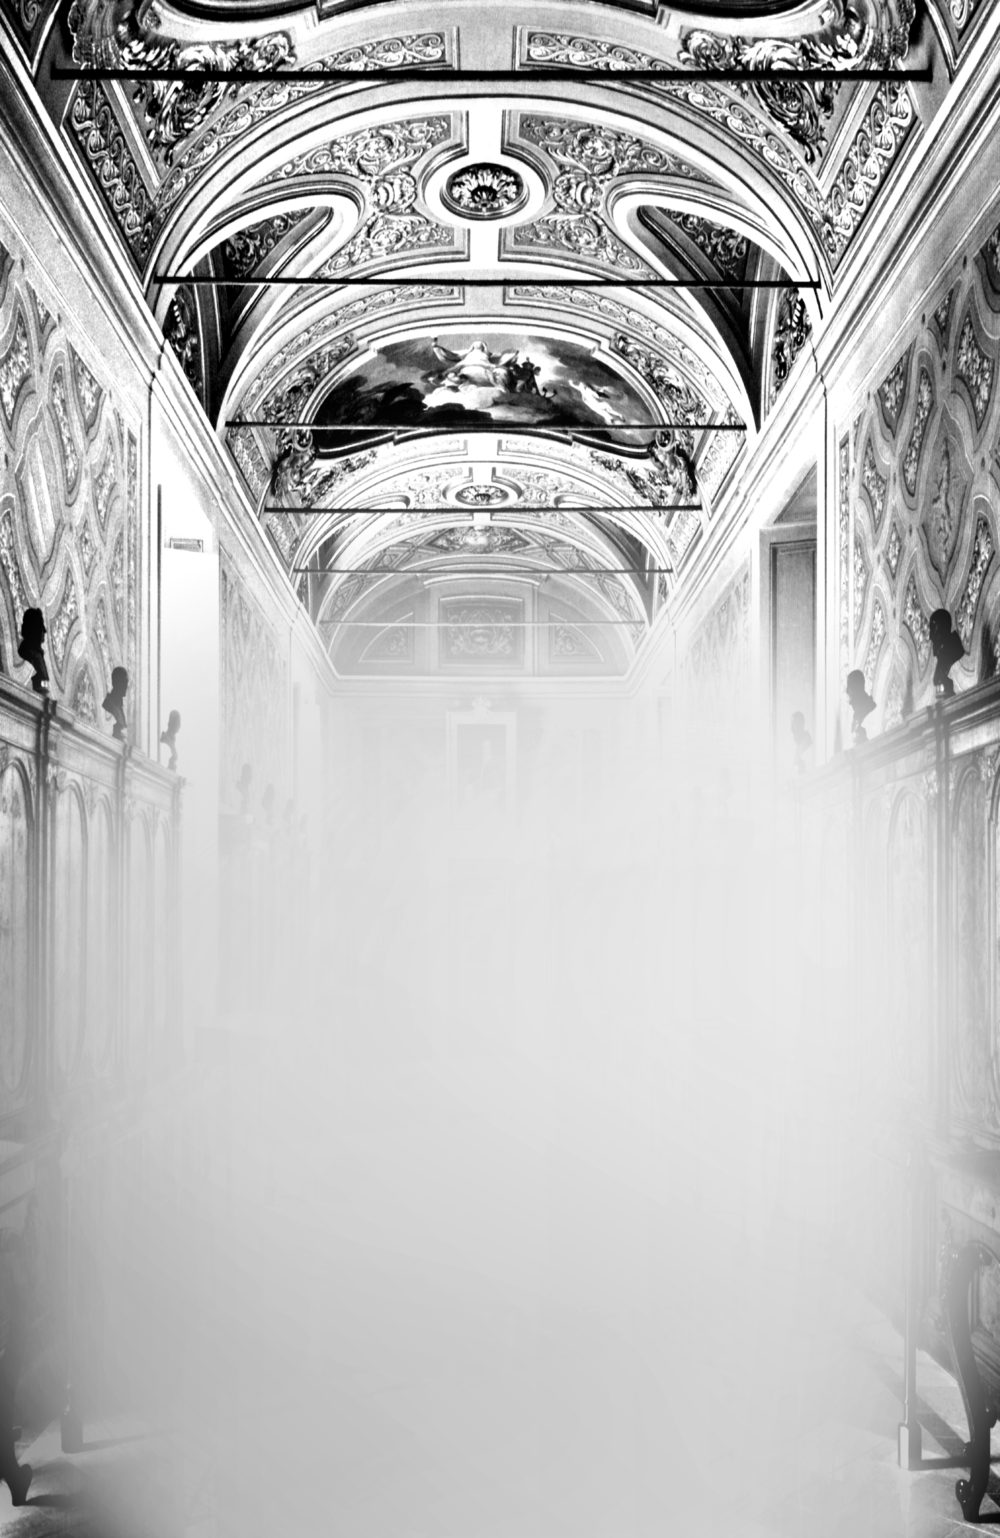 Mariella Bettineschi, L'Era Successiva (Biblioteca Apostolica Vaticana, Roma), 2015, direct print on plexiglass, 156 x 100 cm